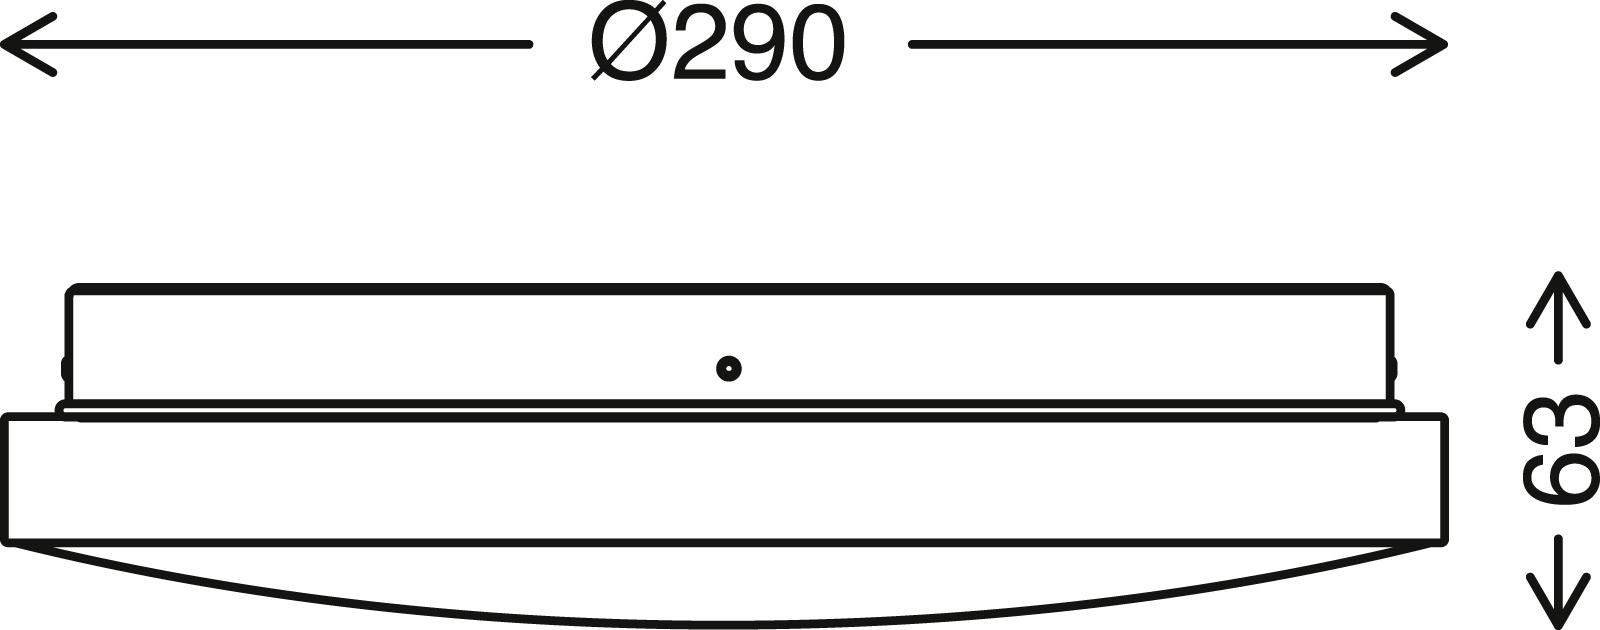 TELEFUNKEN Sensor LED Deckenleuchte, Ø 29 cm, 16 W, Weiss-Chrom